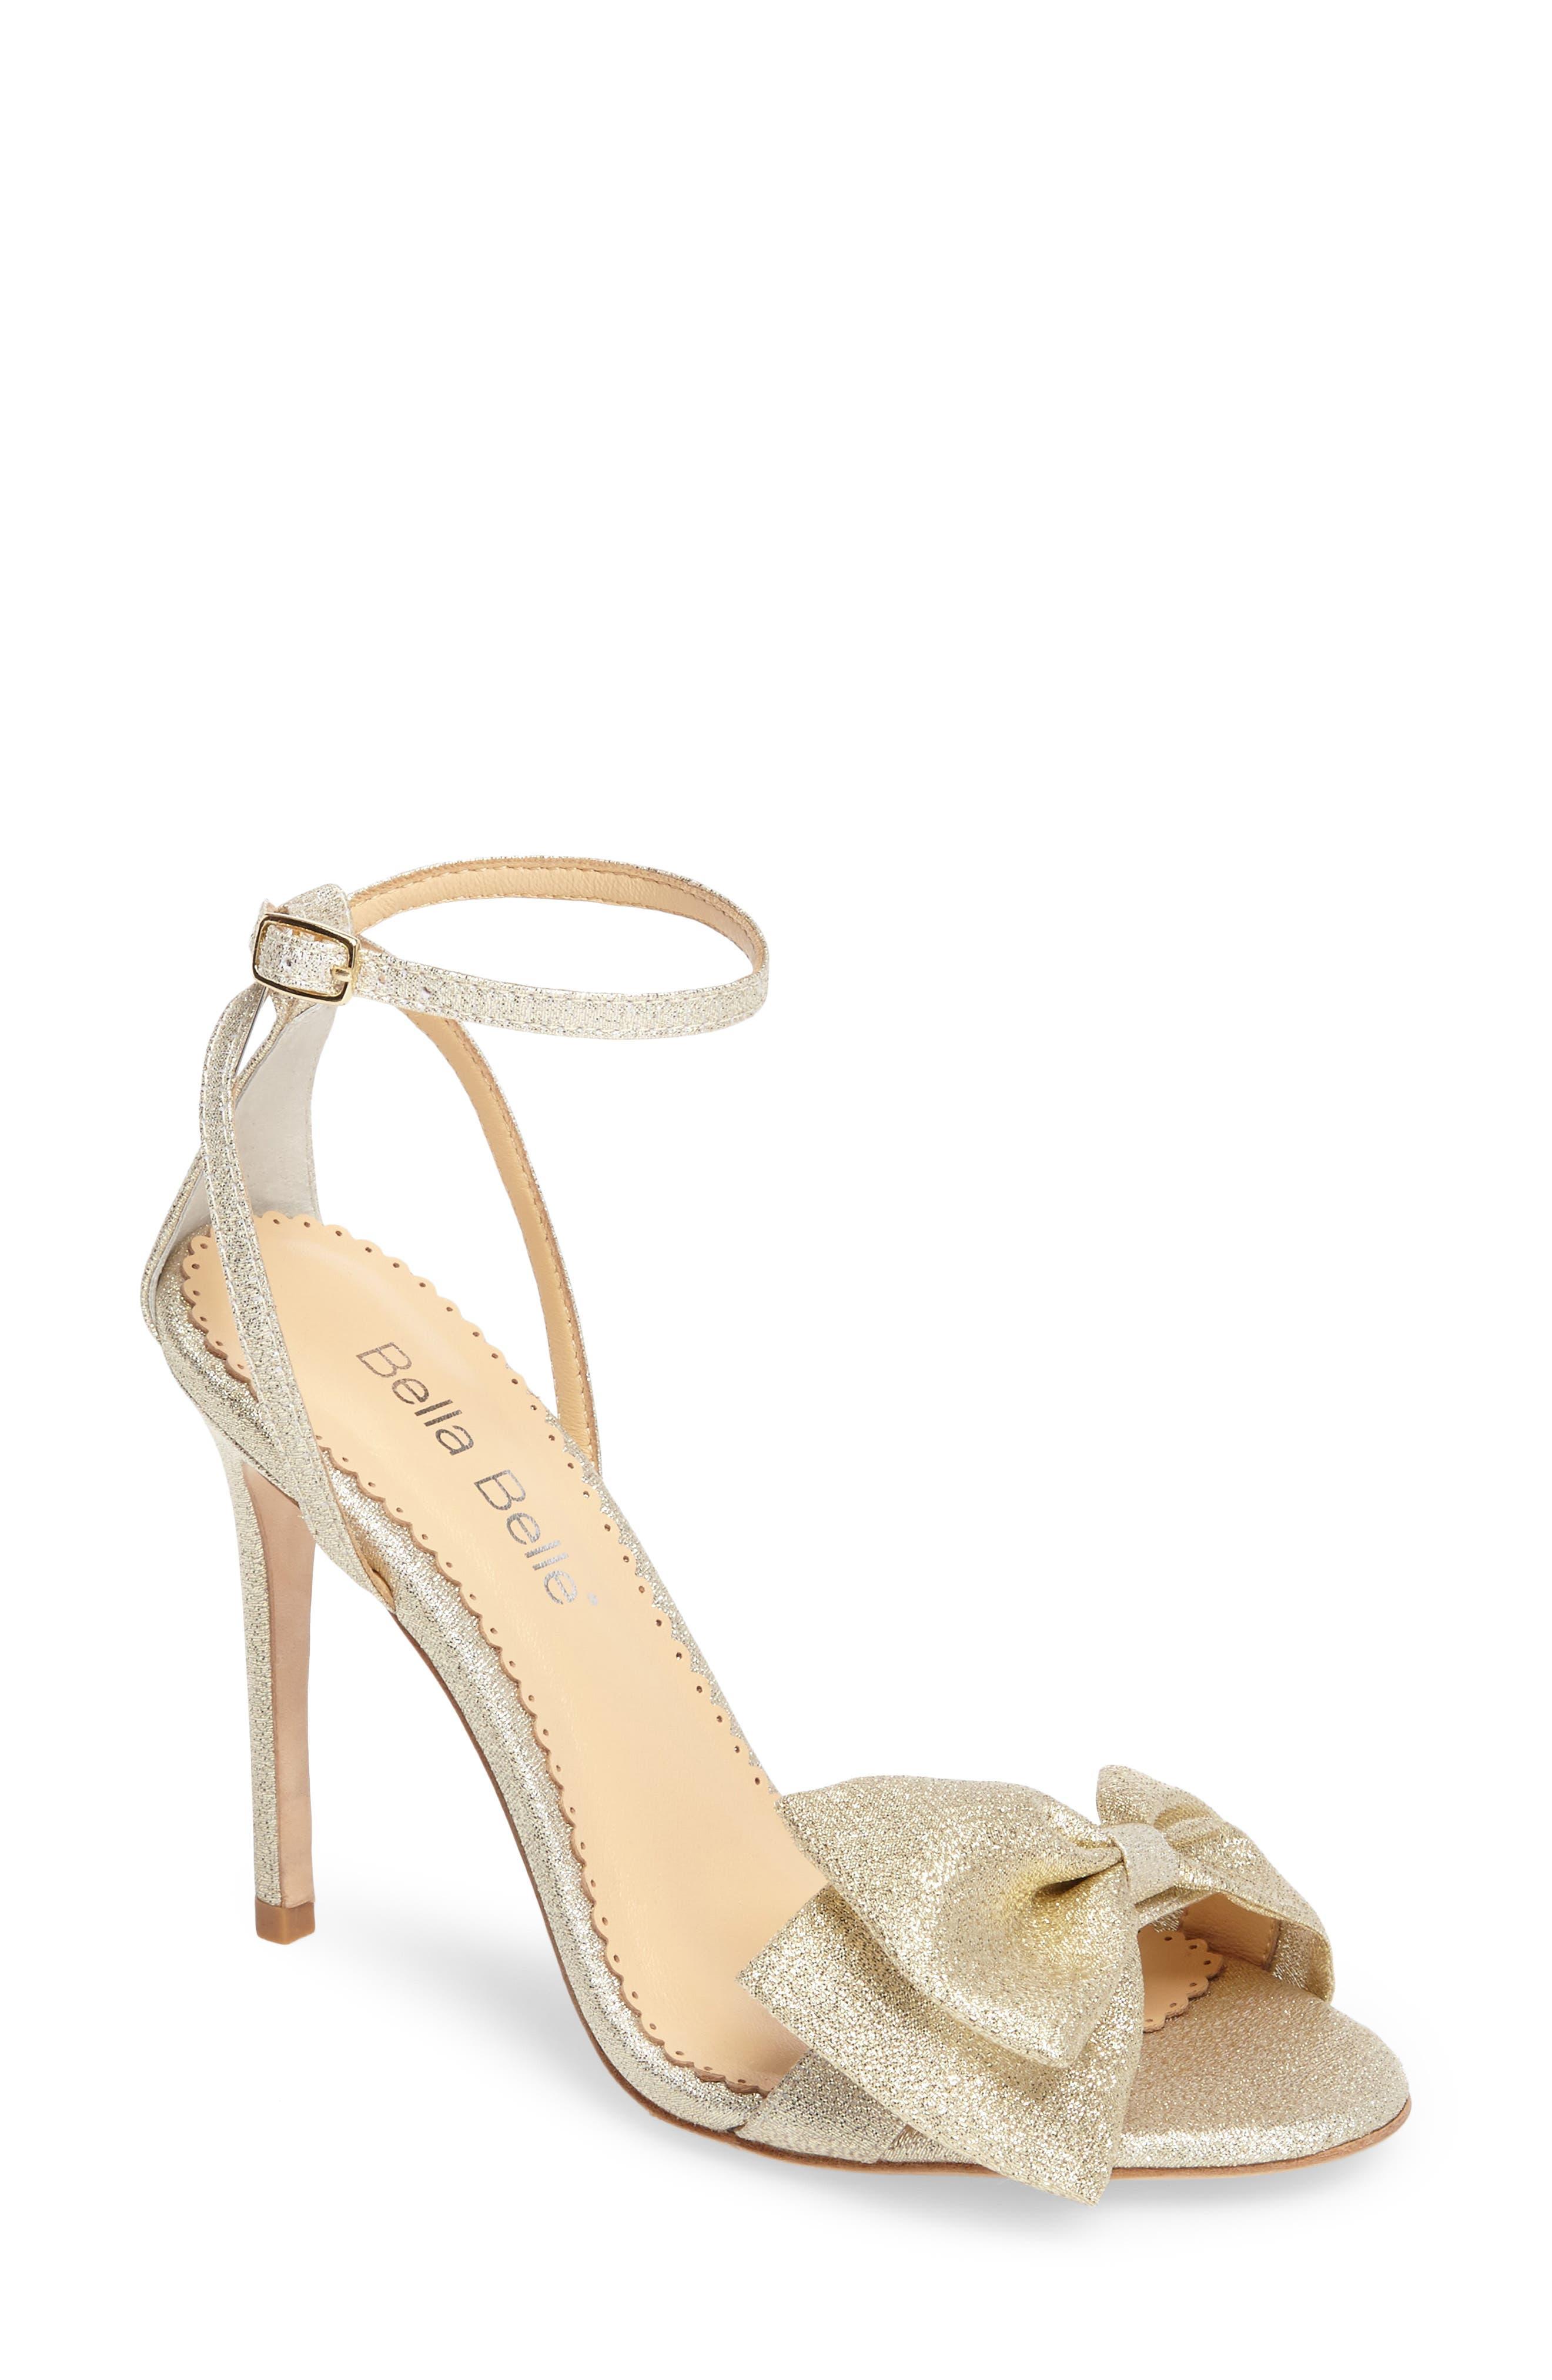 Aubrey Bow Ankle Strap Sandal,                             Main thumbnail 1, color,                             GOLD